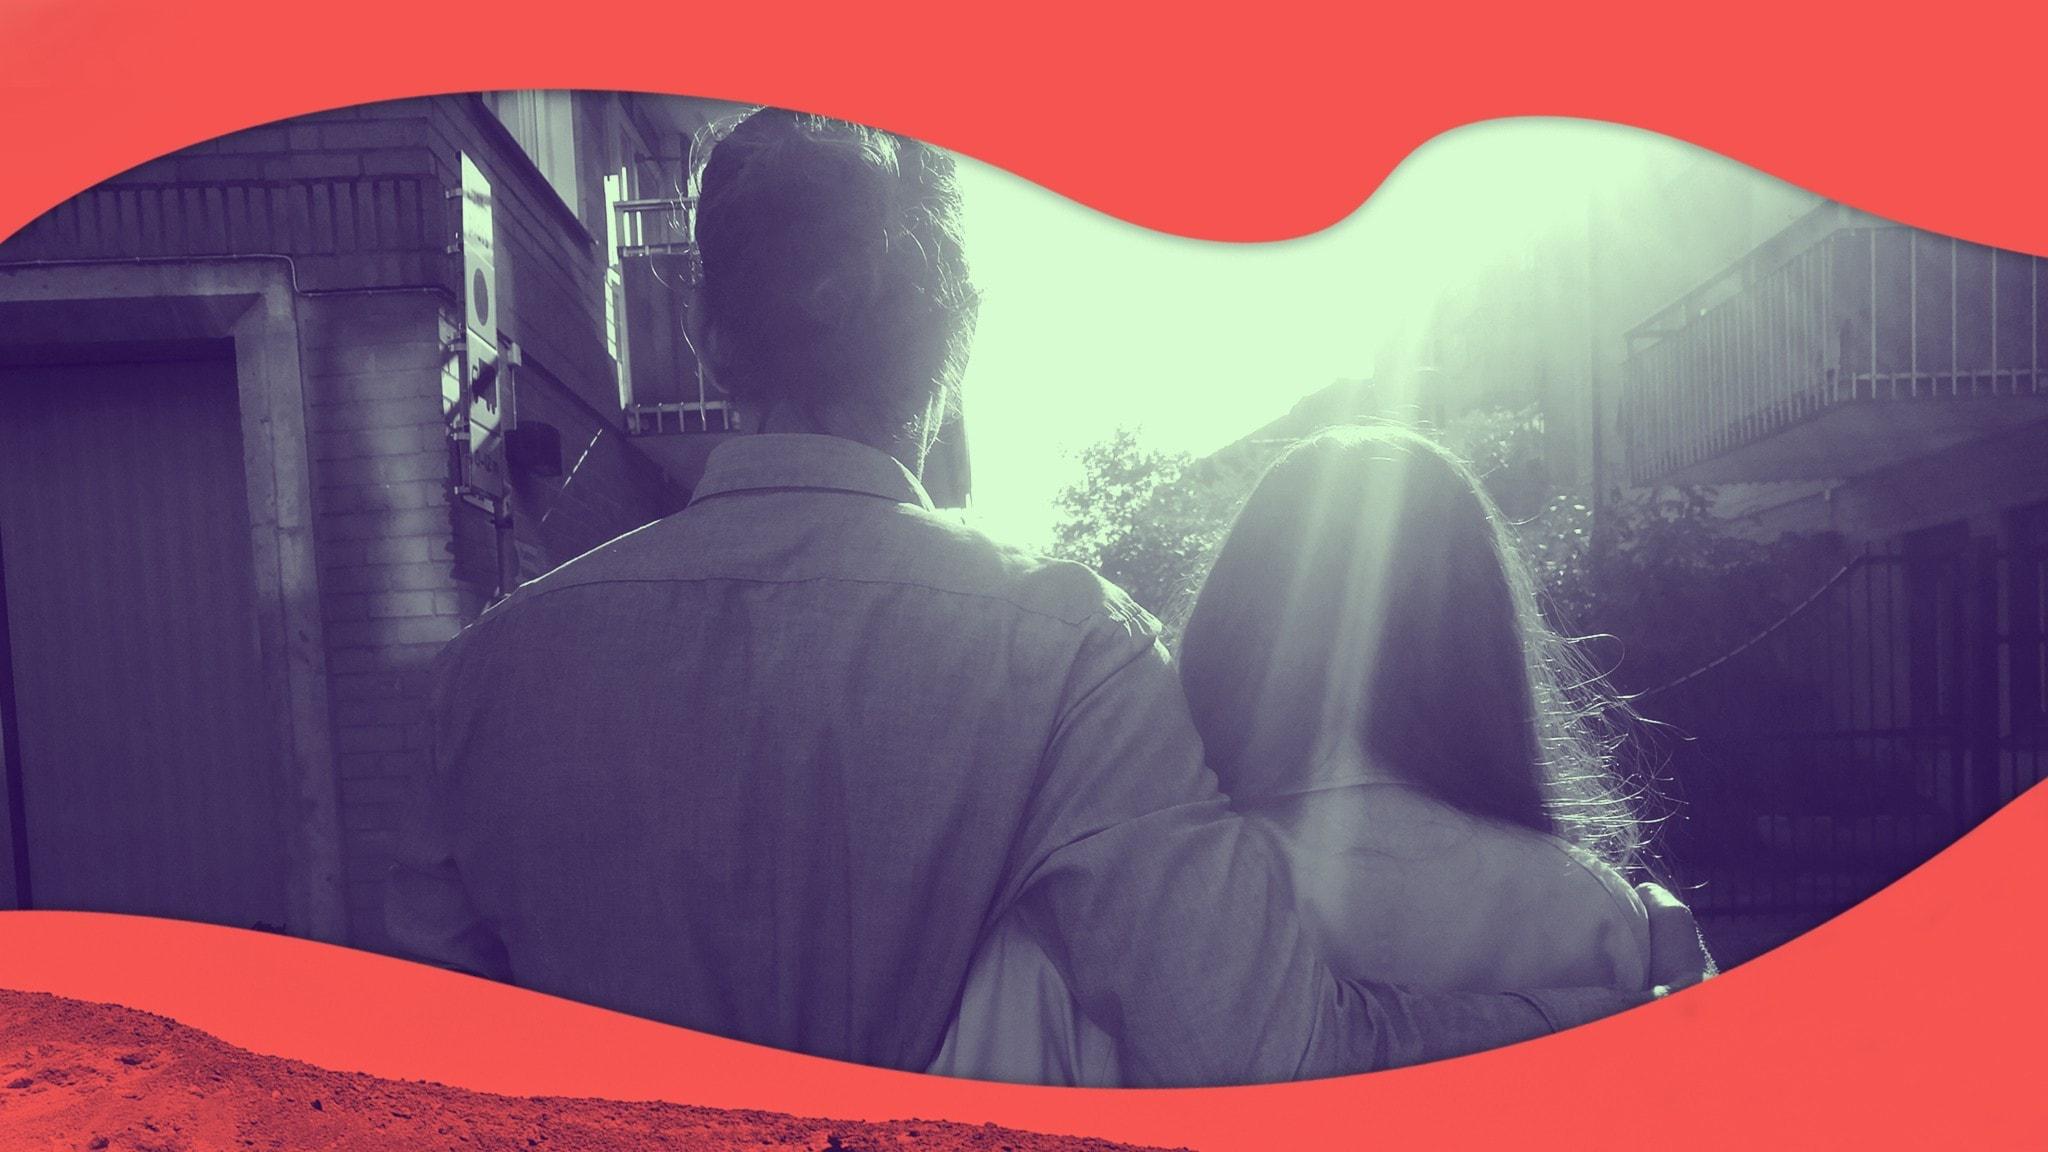 Missbrukade i hemlighet – perfekta parets bekännelser